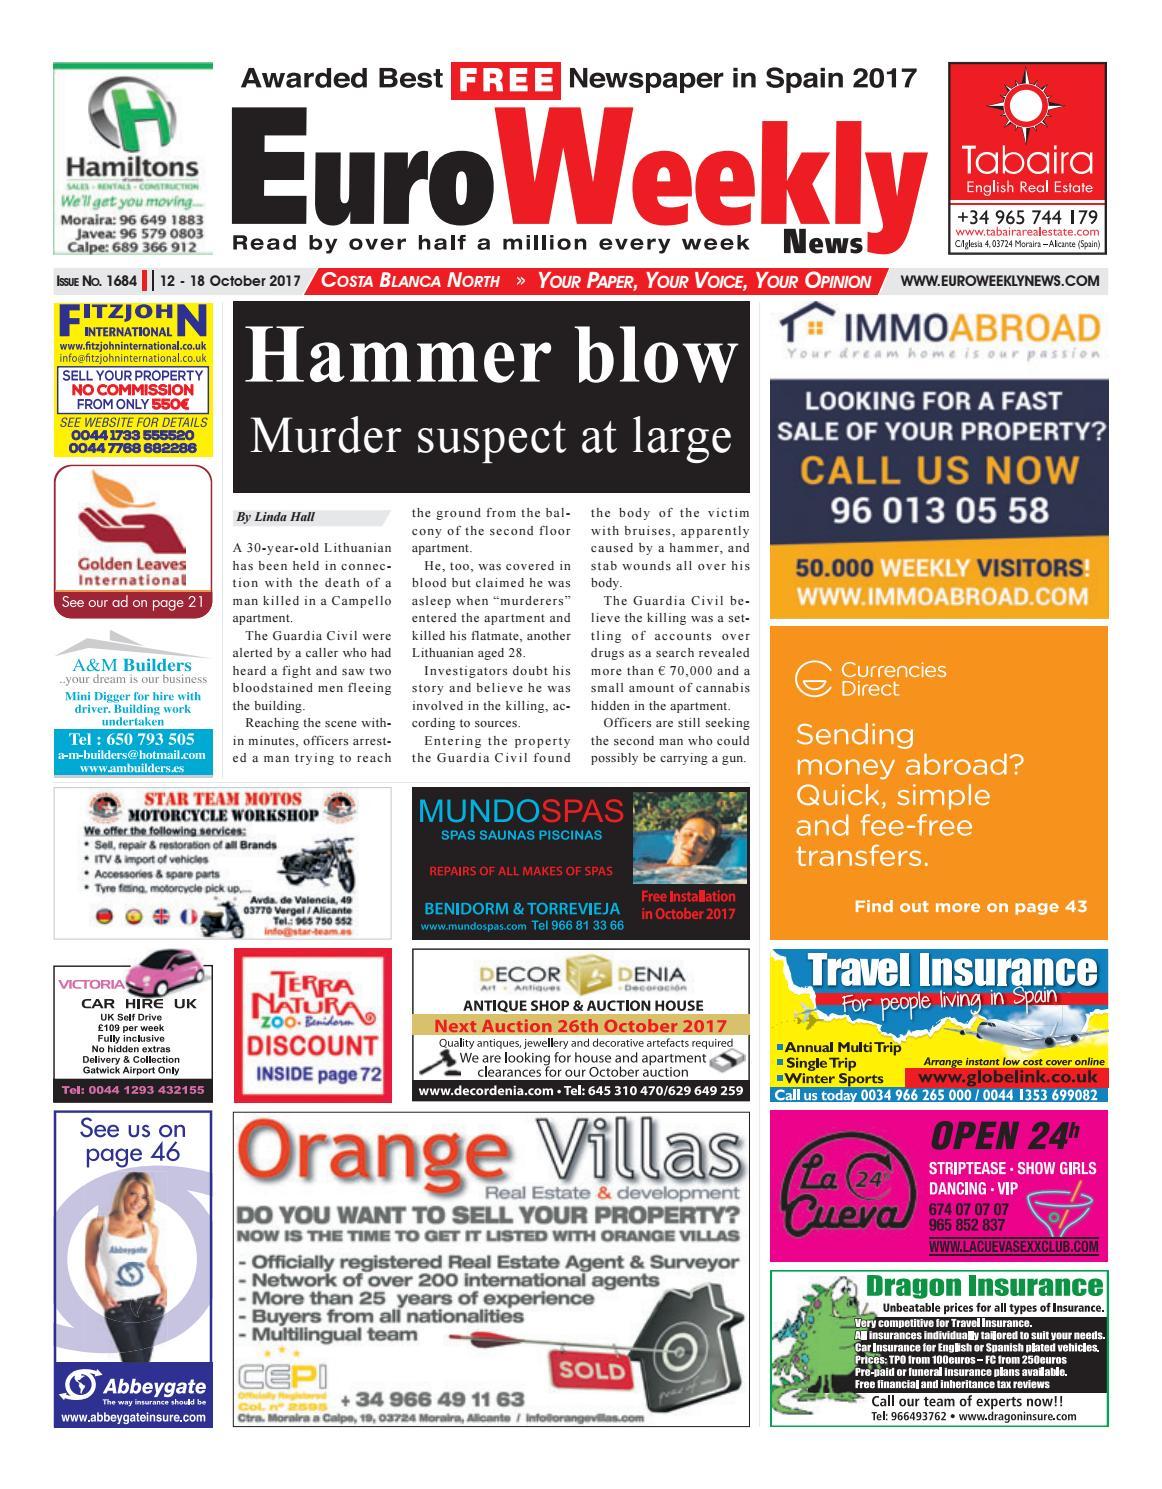 Euro weekly news costa blanca north 12 18 october 2017 issue euro weekly news costa blanca north 12 18 october 2017 issue 1684 by euro weekly news media sa issuu fandeluxe Choice Image